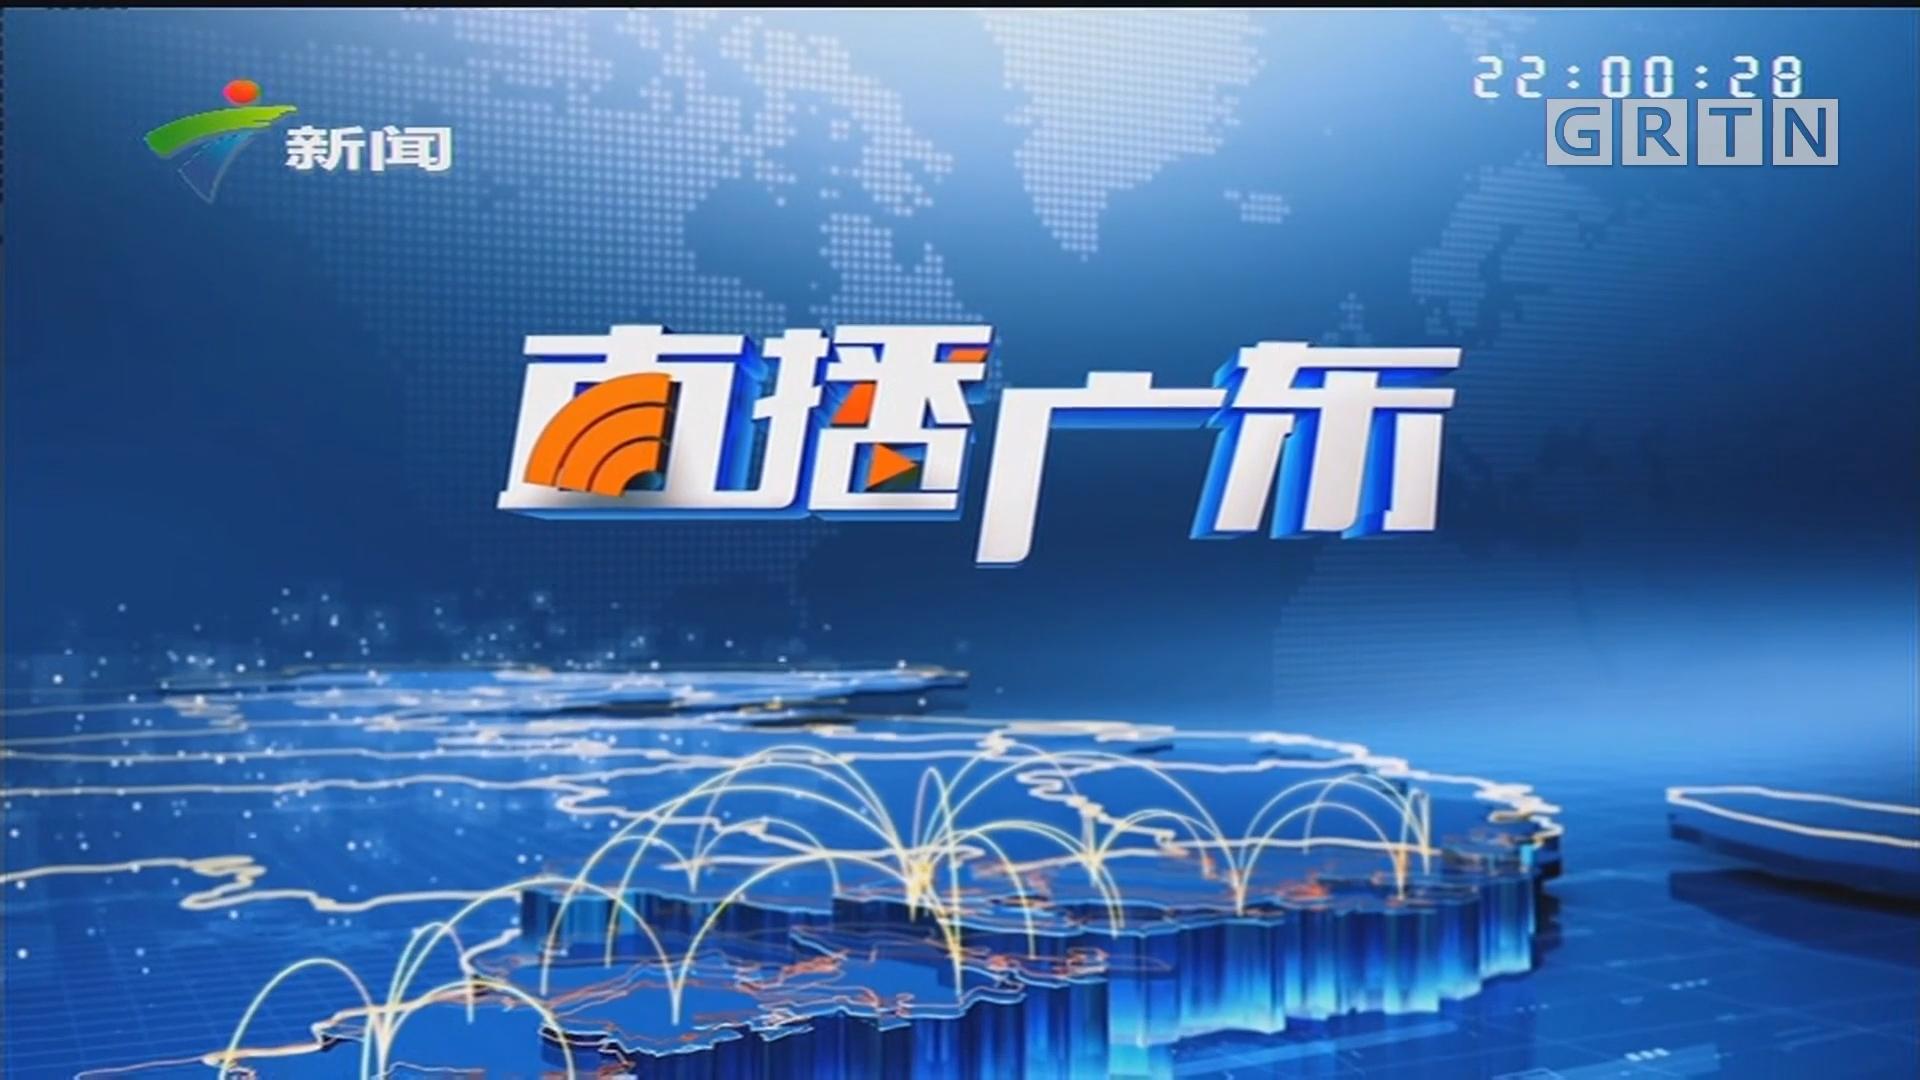 [HD][2019-10-04]直播广东:国庆假期第四天 广州南站客流高峰持续